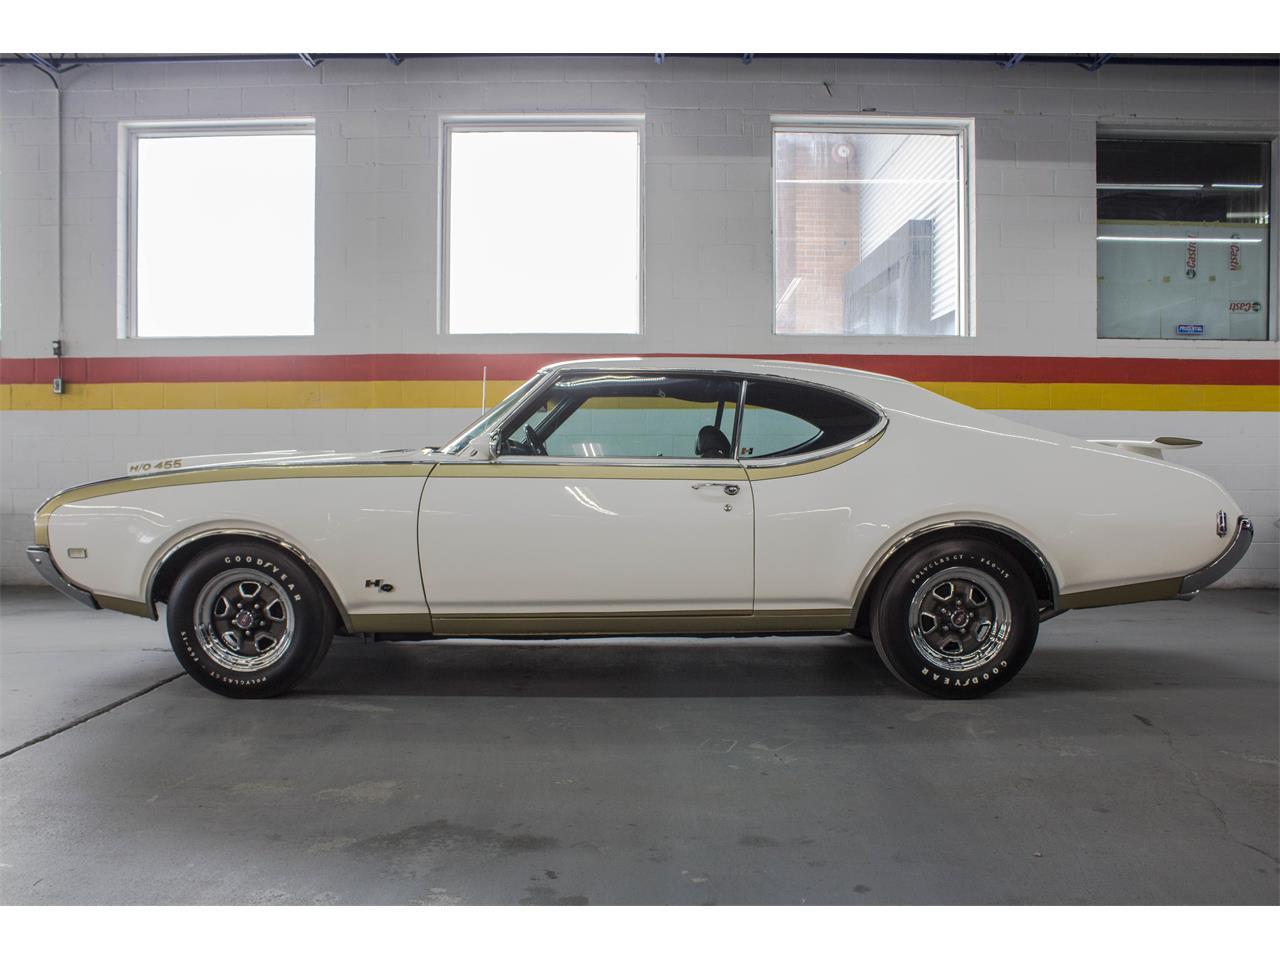 Large Picture of Classic 1969 Hurst located in Quebec - $89,995.00 - GA07